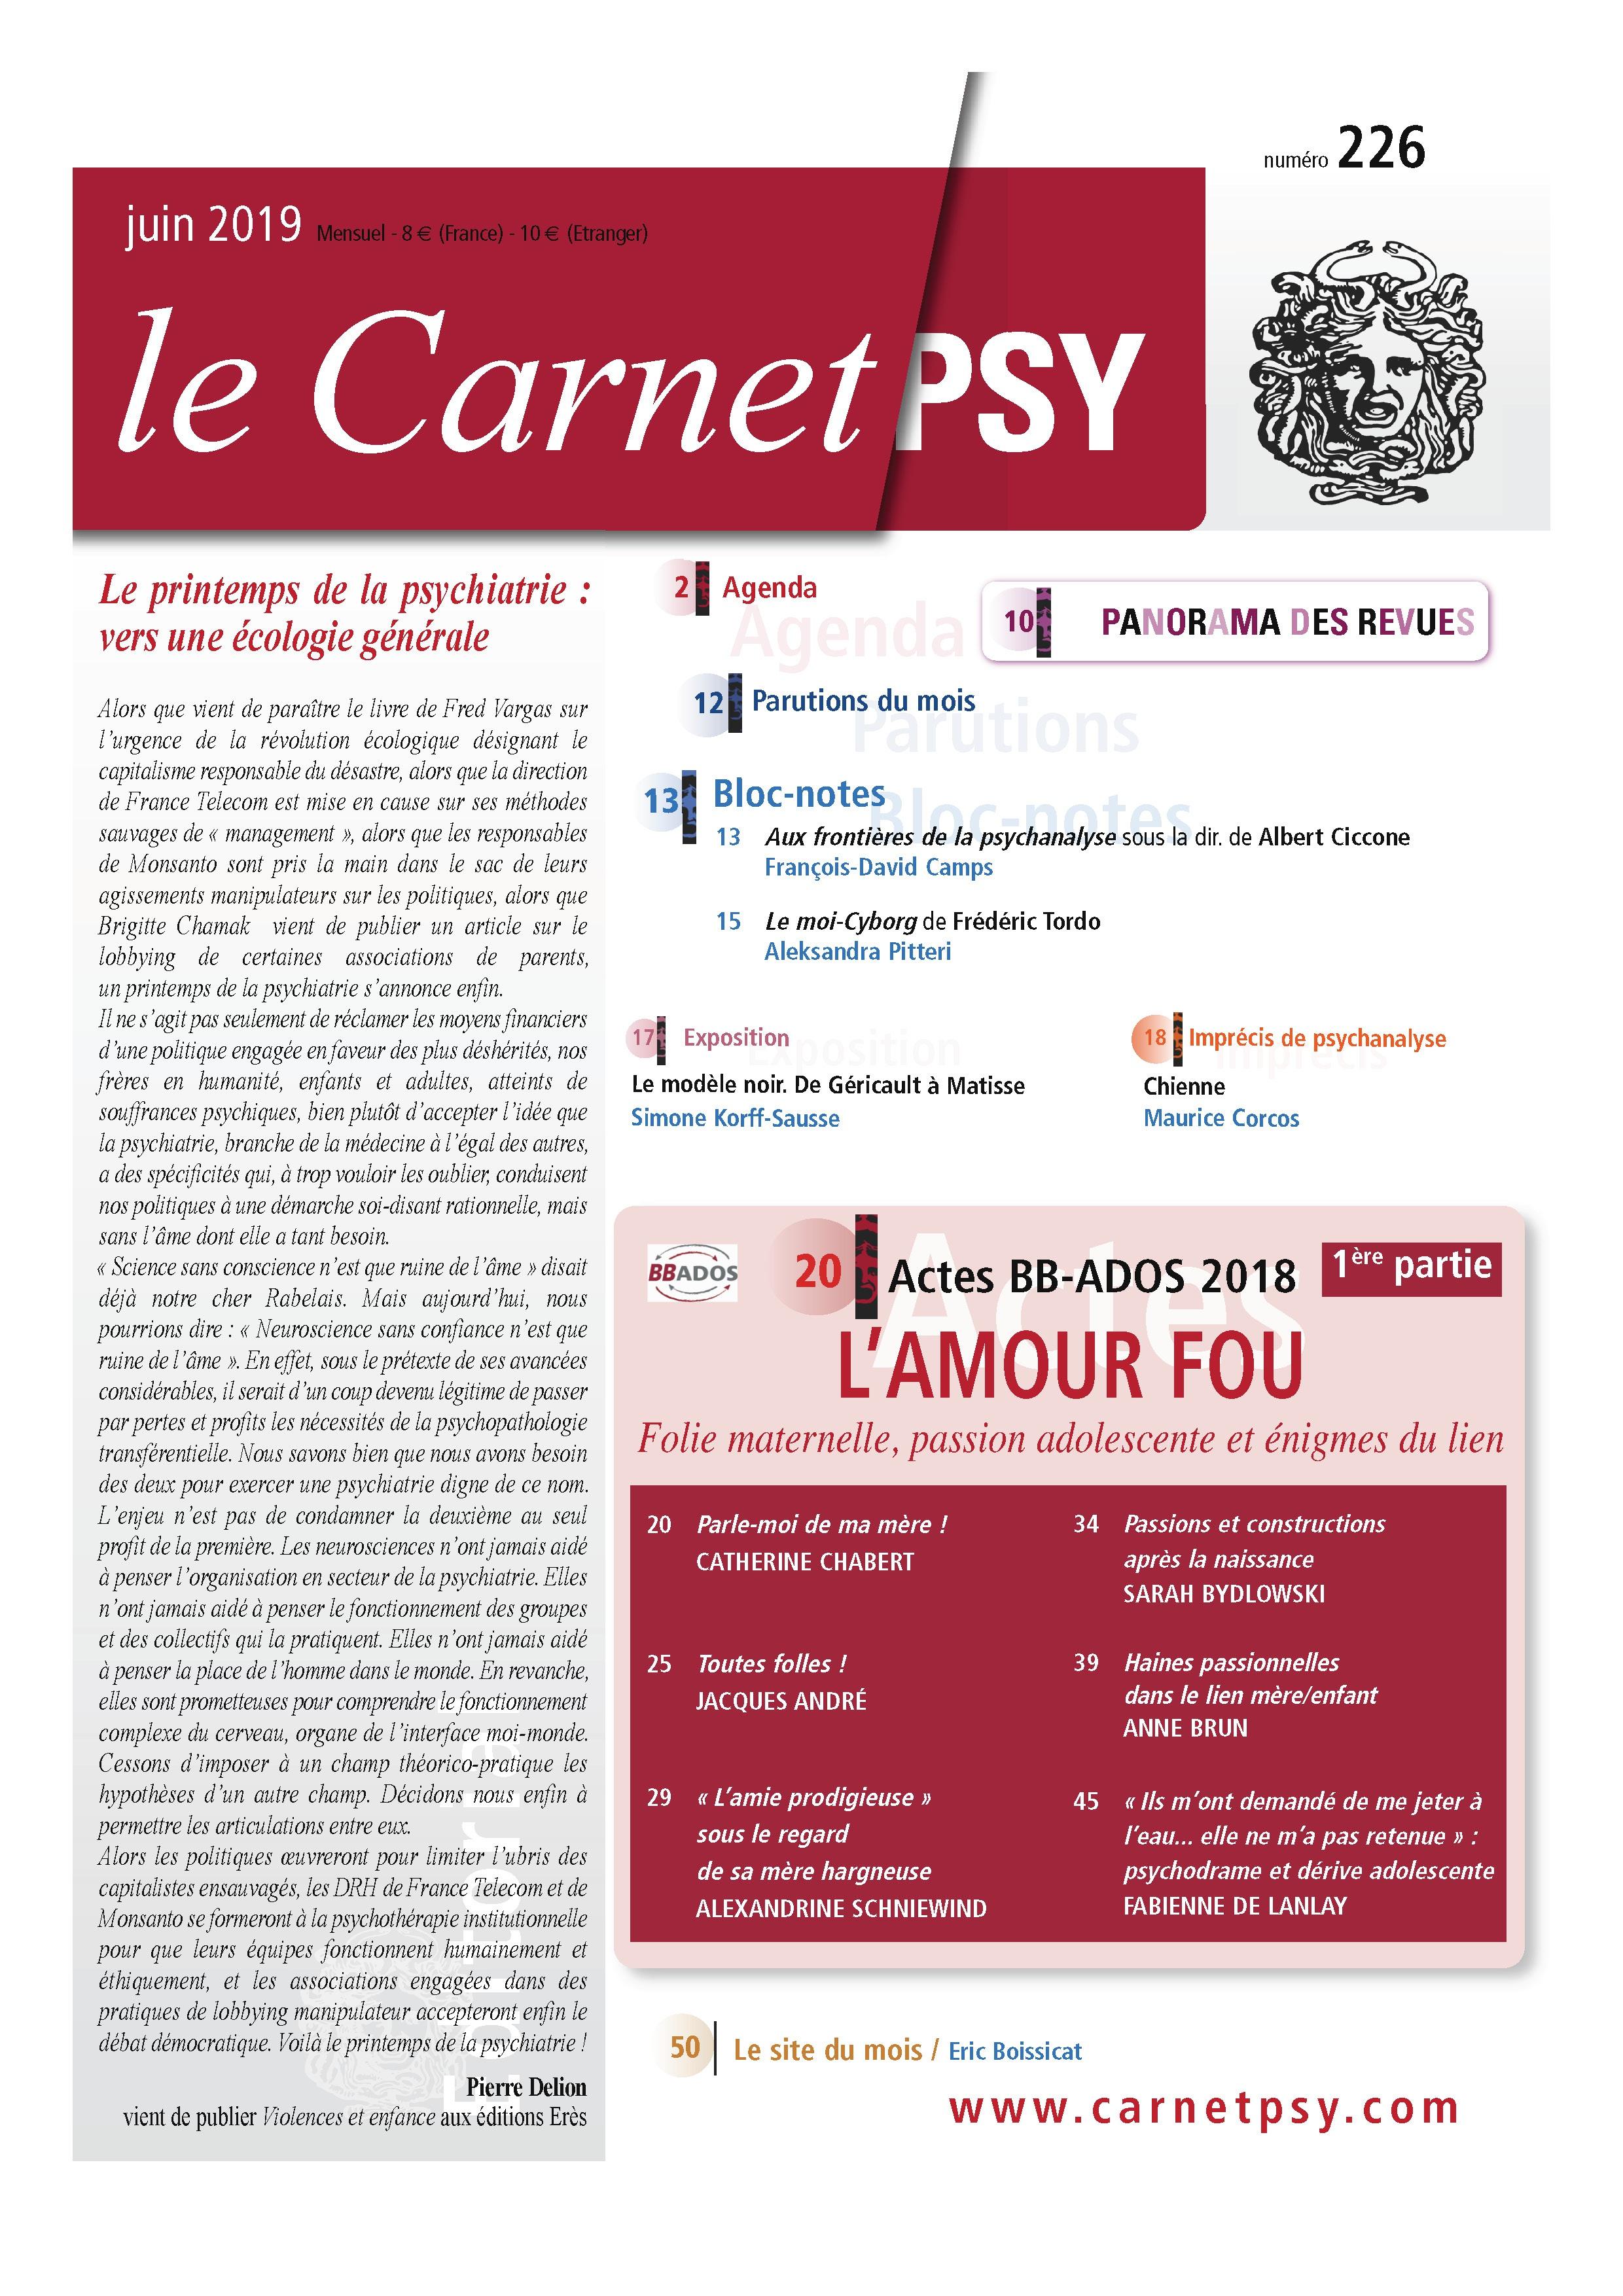 Le Carnet Psy n° 226